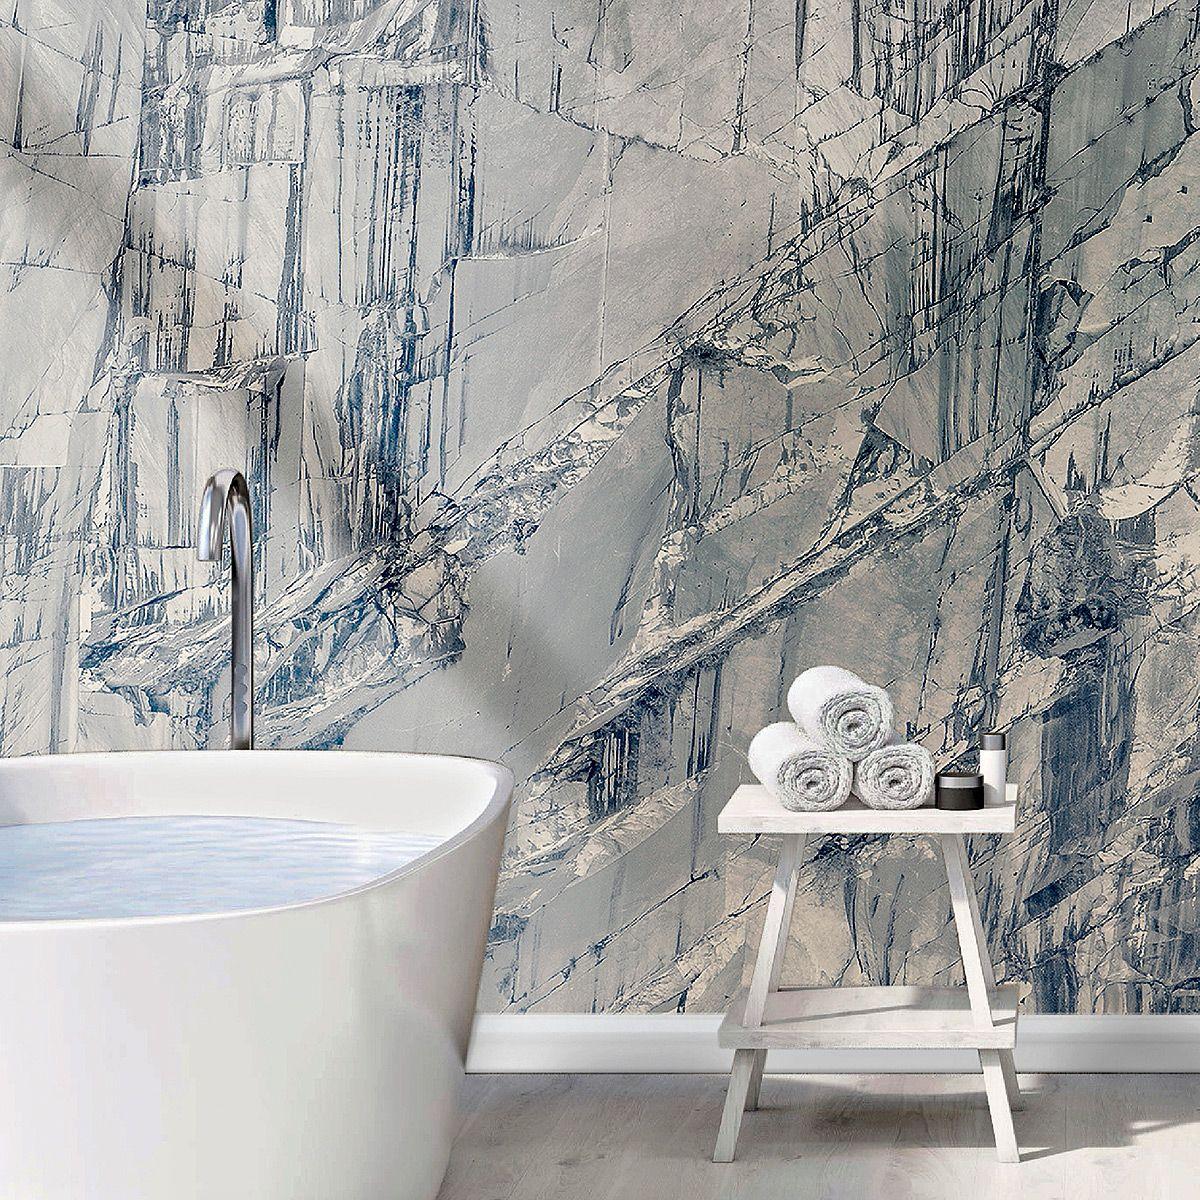 Glasfaservliestapete Naturalmente Von Wallpepper Bild 3 Badezimmer Tapete Tapete Fur Bad Badezimmer